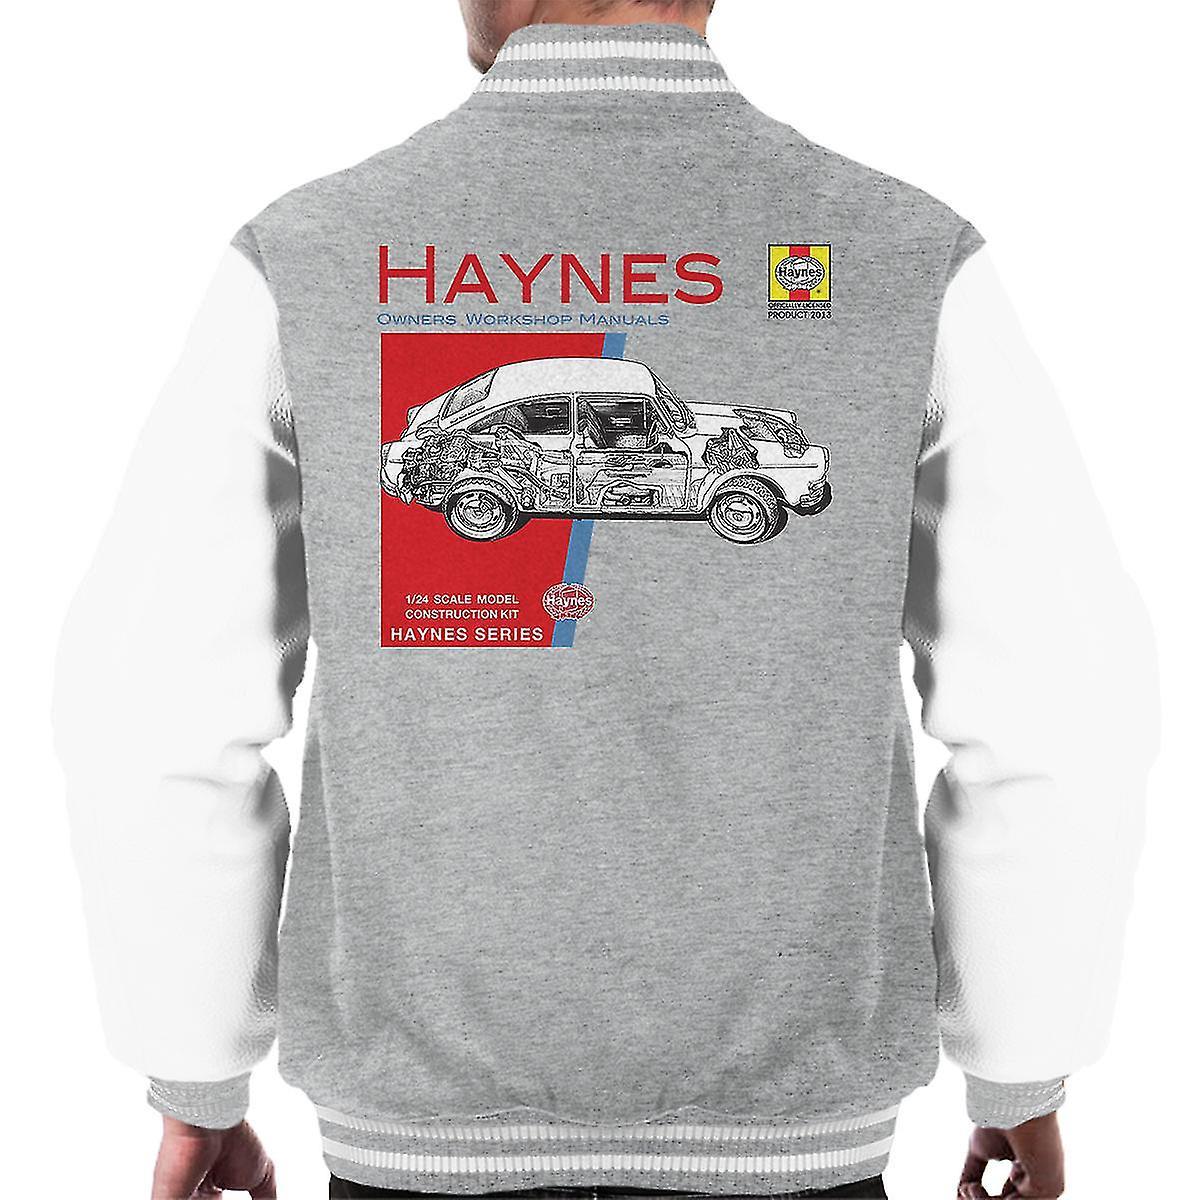 Haynes Owners Workshop Manual 0084 Volkswagen 1600 Fastback mannen Varsity Jacket